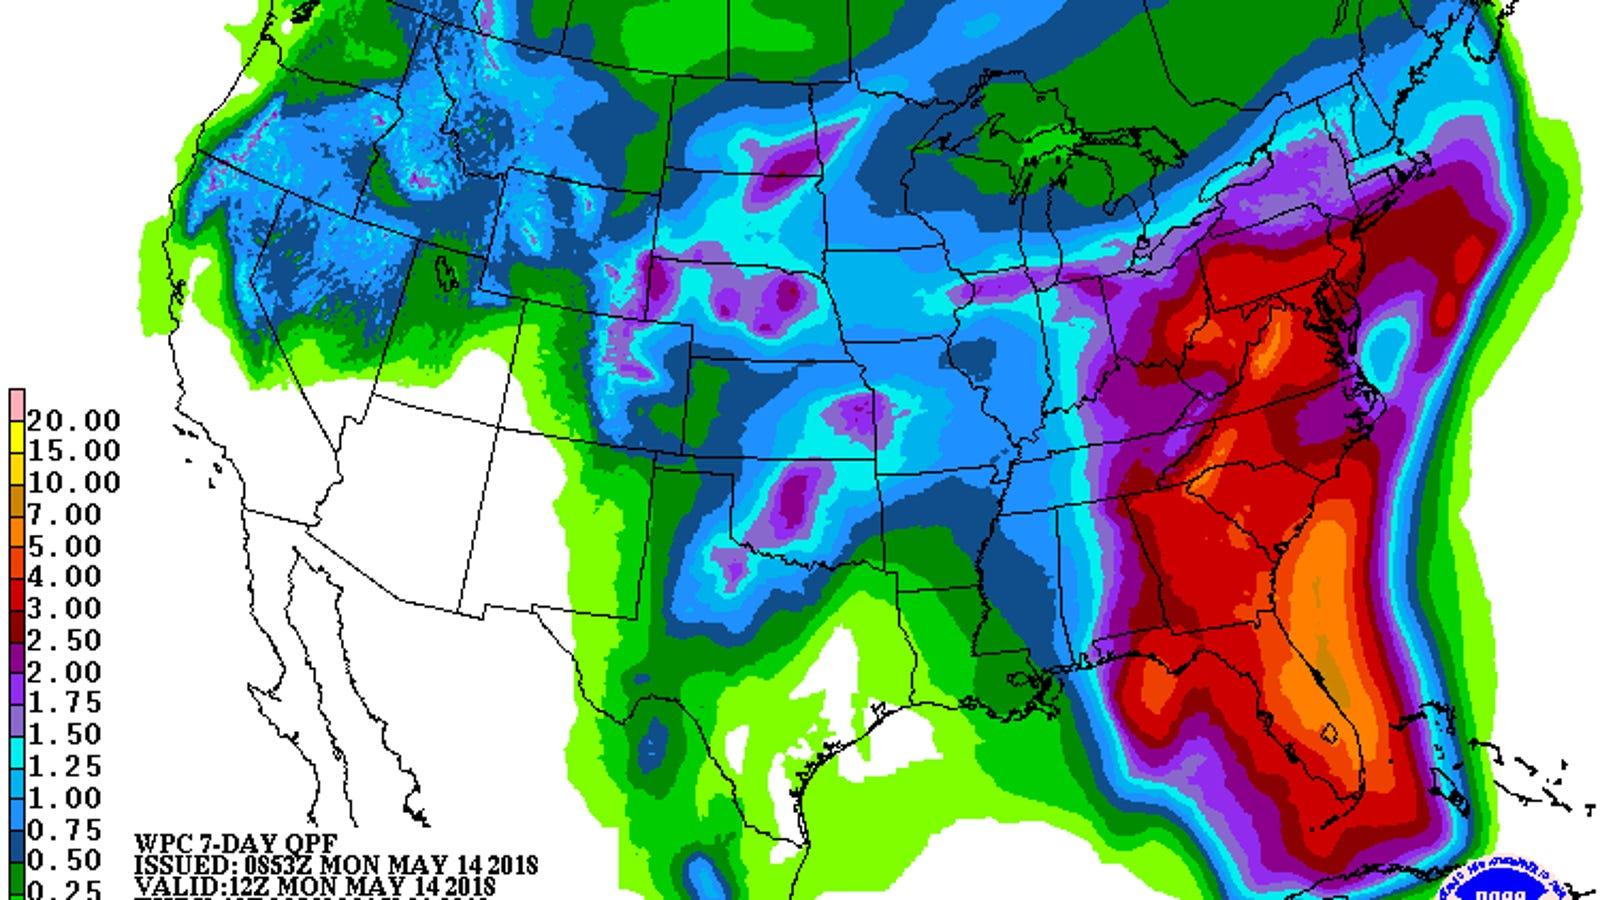 Florida May Get a Tropical Cyclone This Week